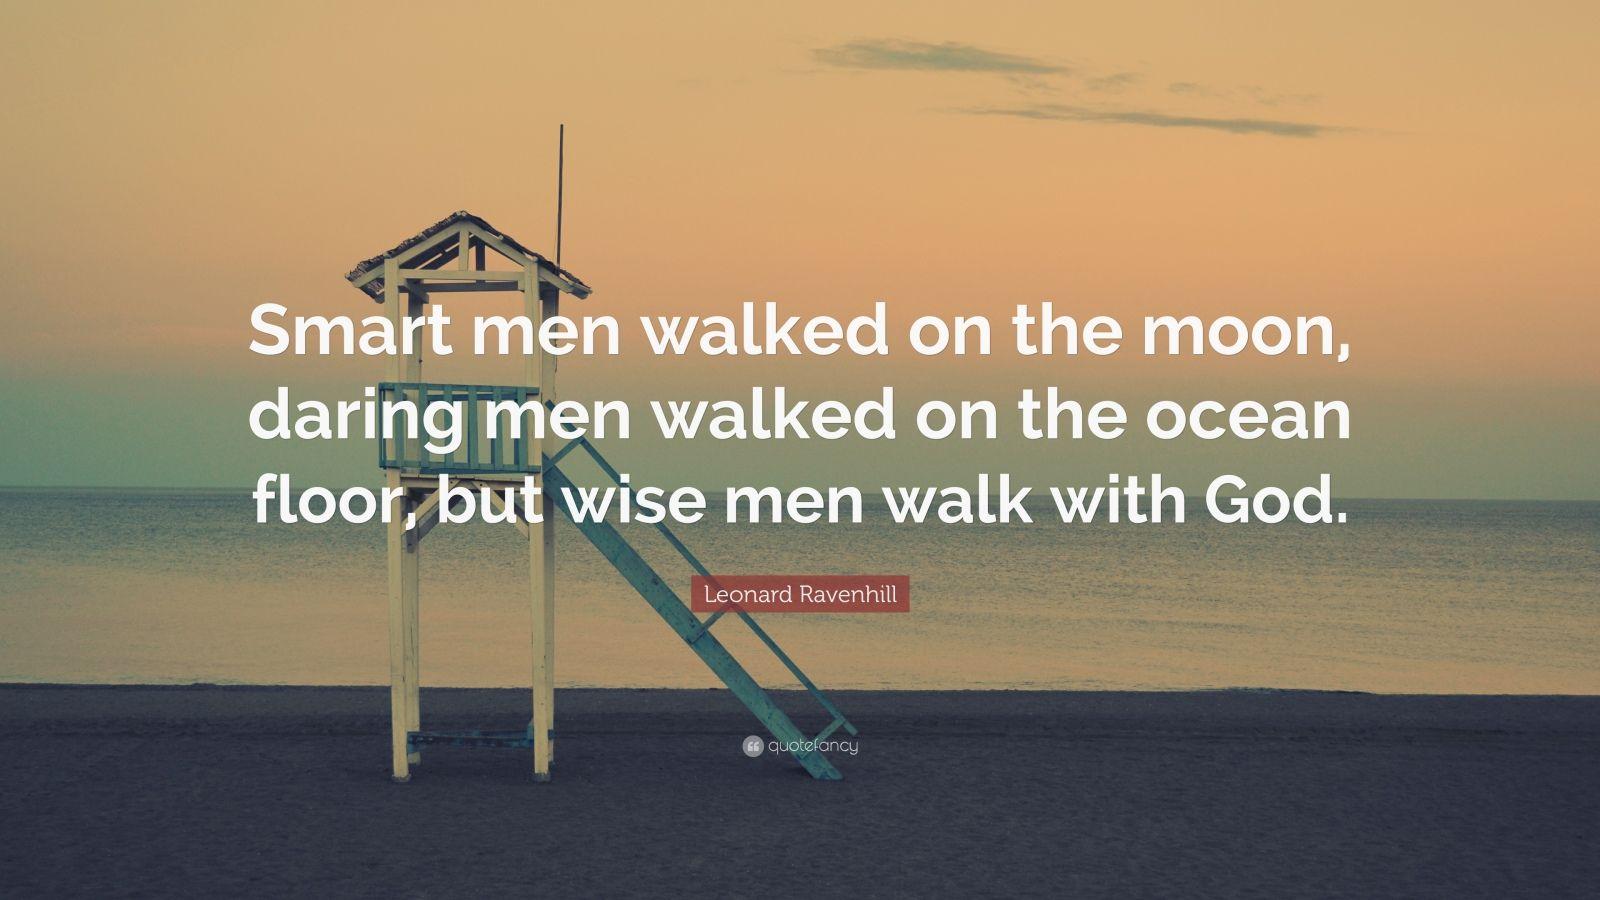 Nick Vujicic Quotes Wallpaper Leonard Ravenhill Quote Smart Men Walked On The Moon